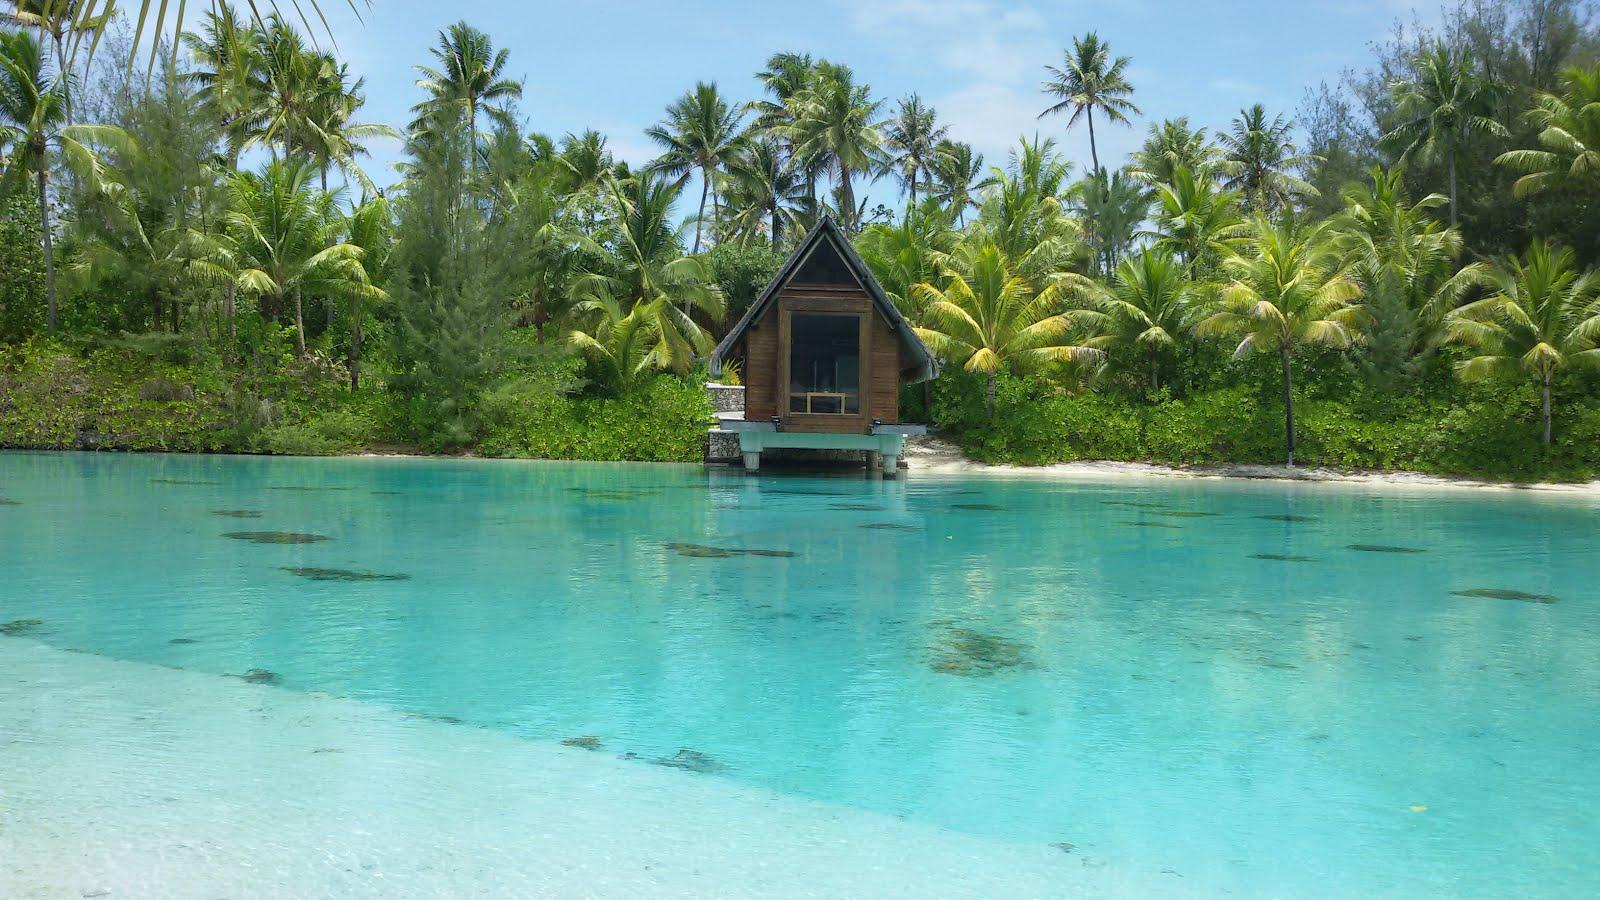 O meu azul Polinesiano